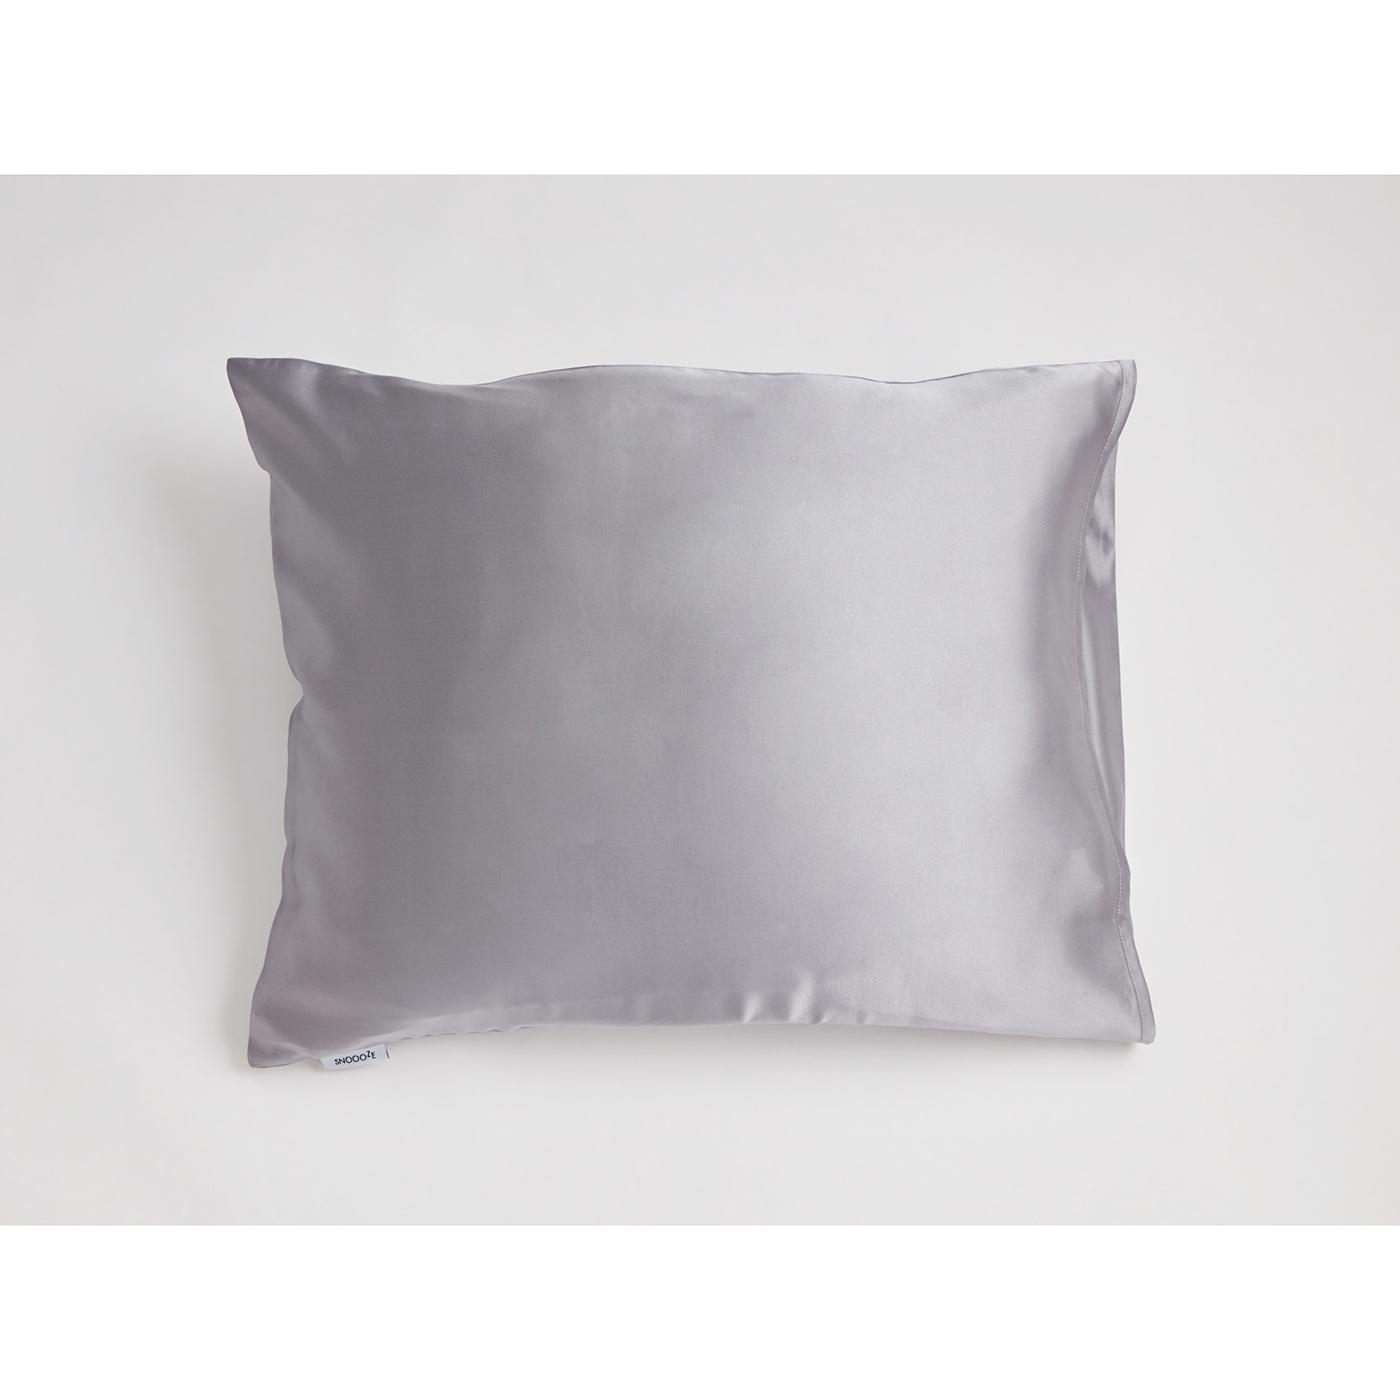 Snoooze grey silk pillowcase